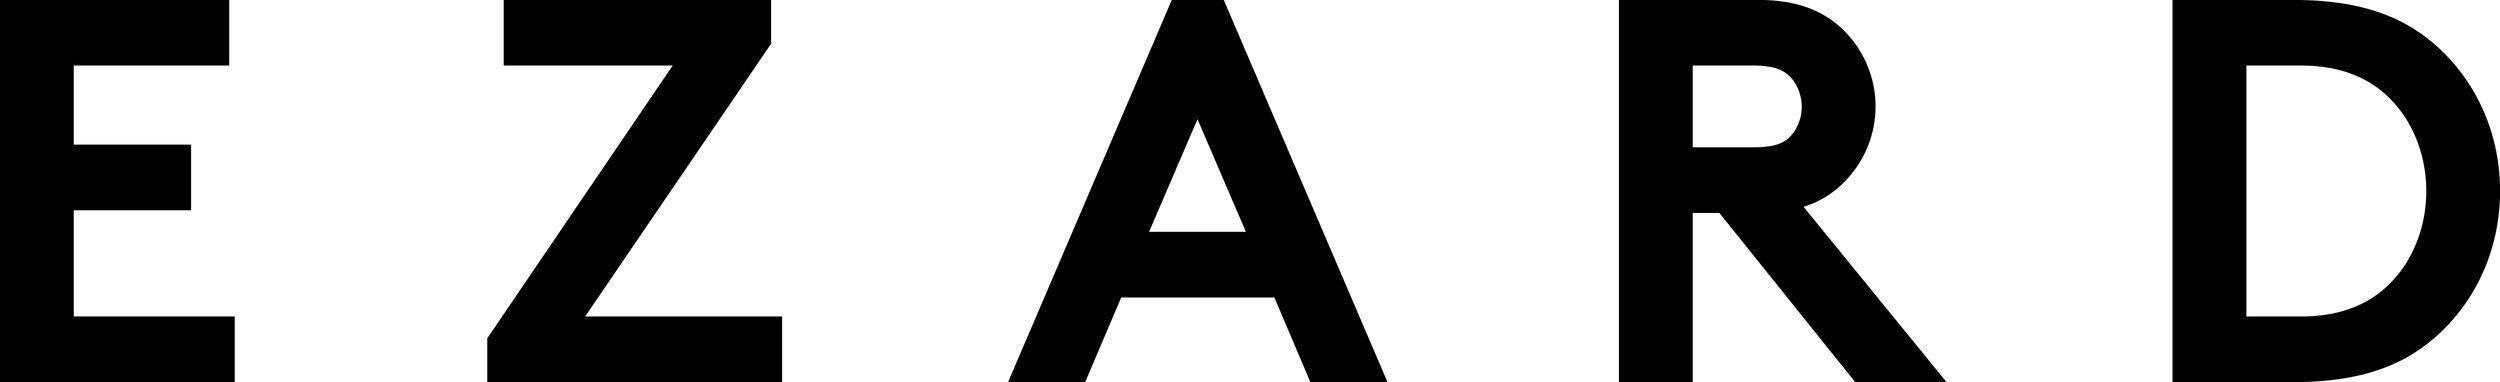 Ezard_Logo_AW.jpeg